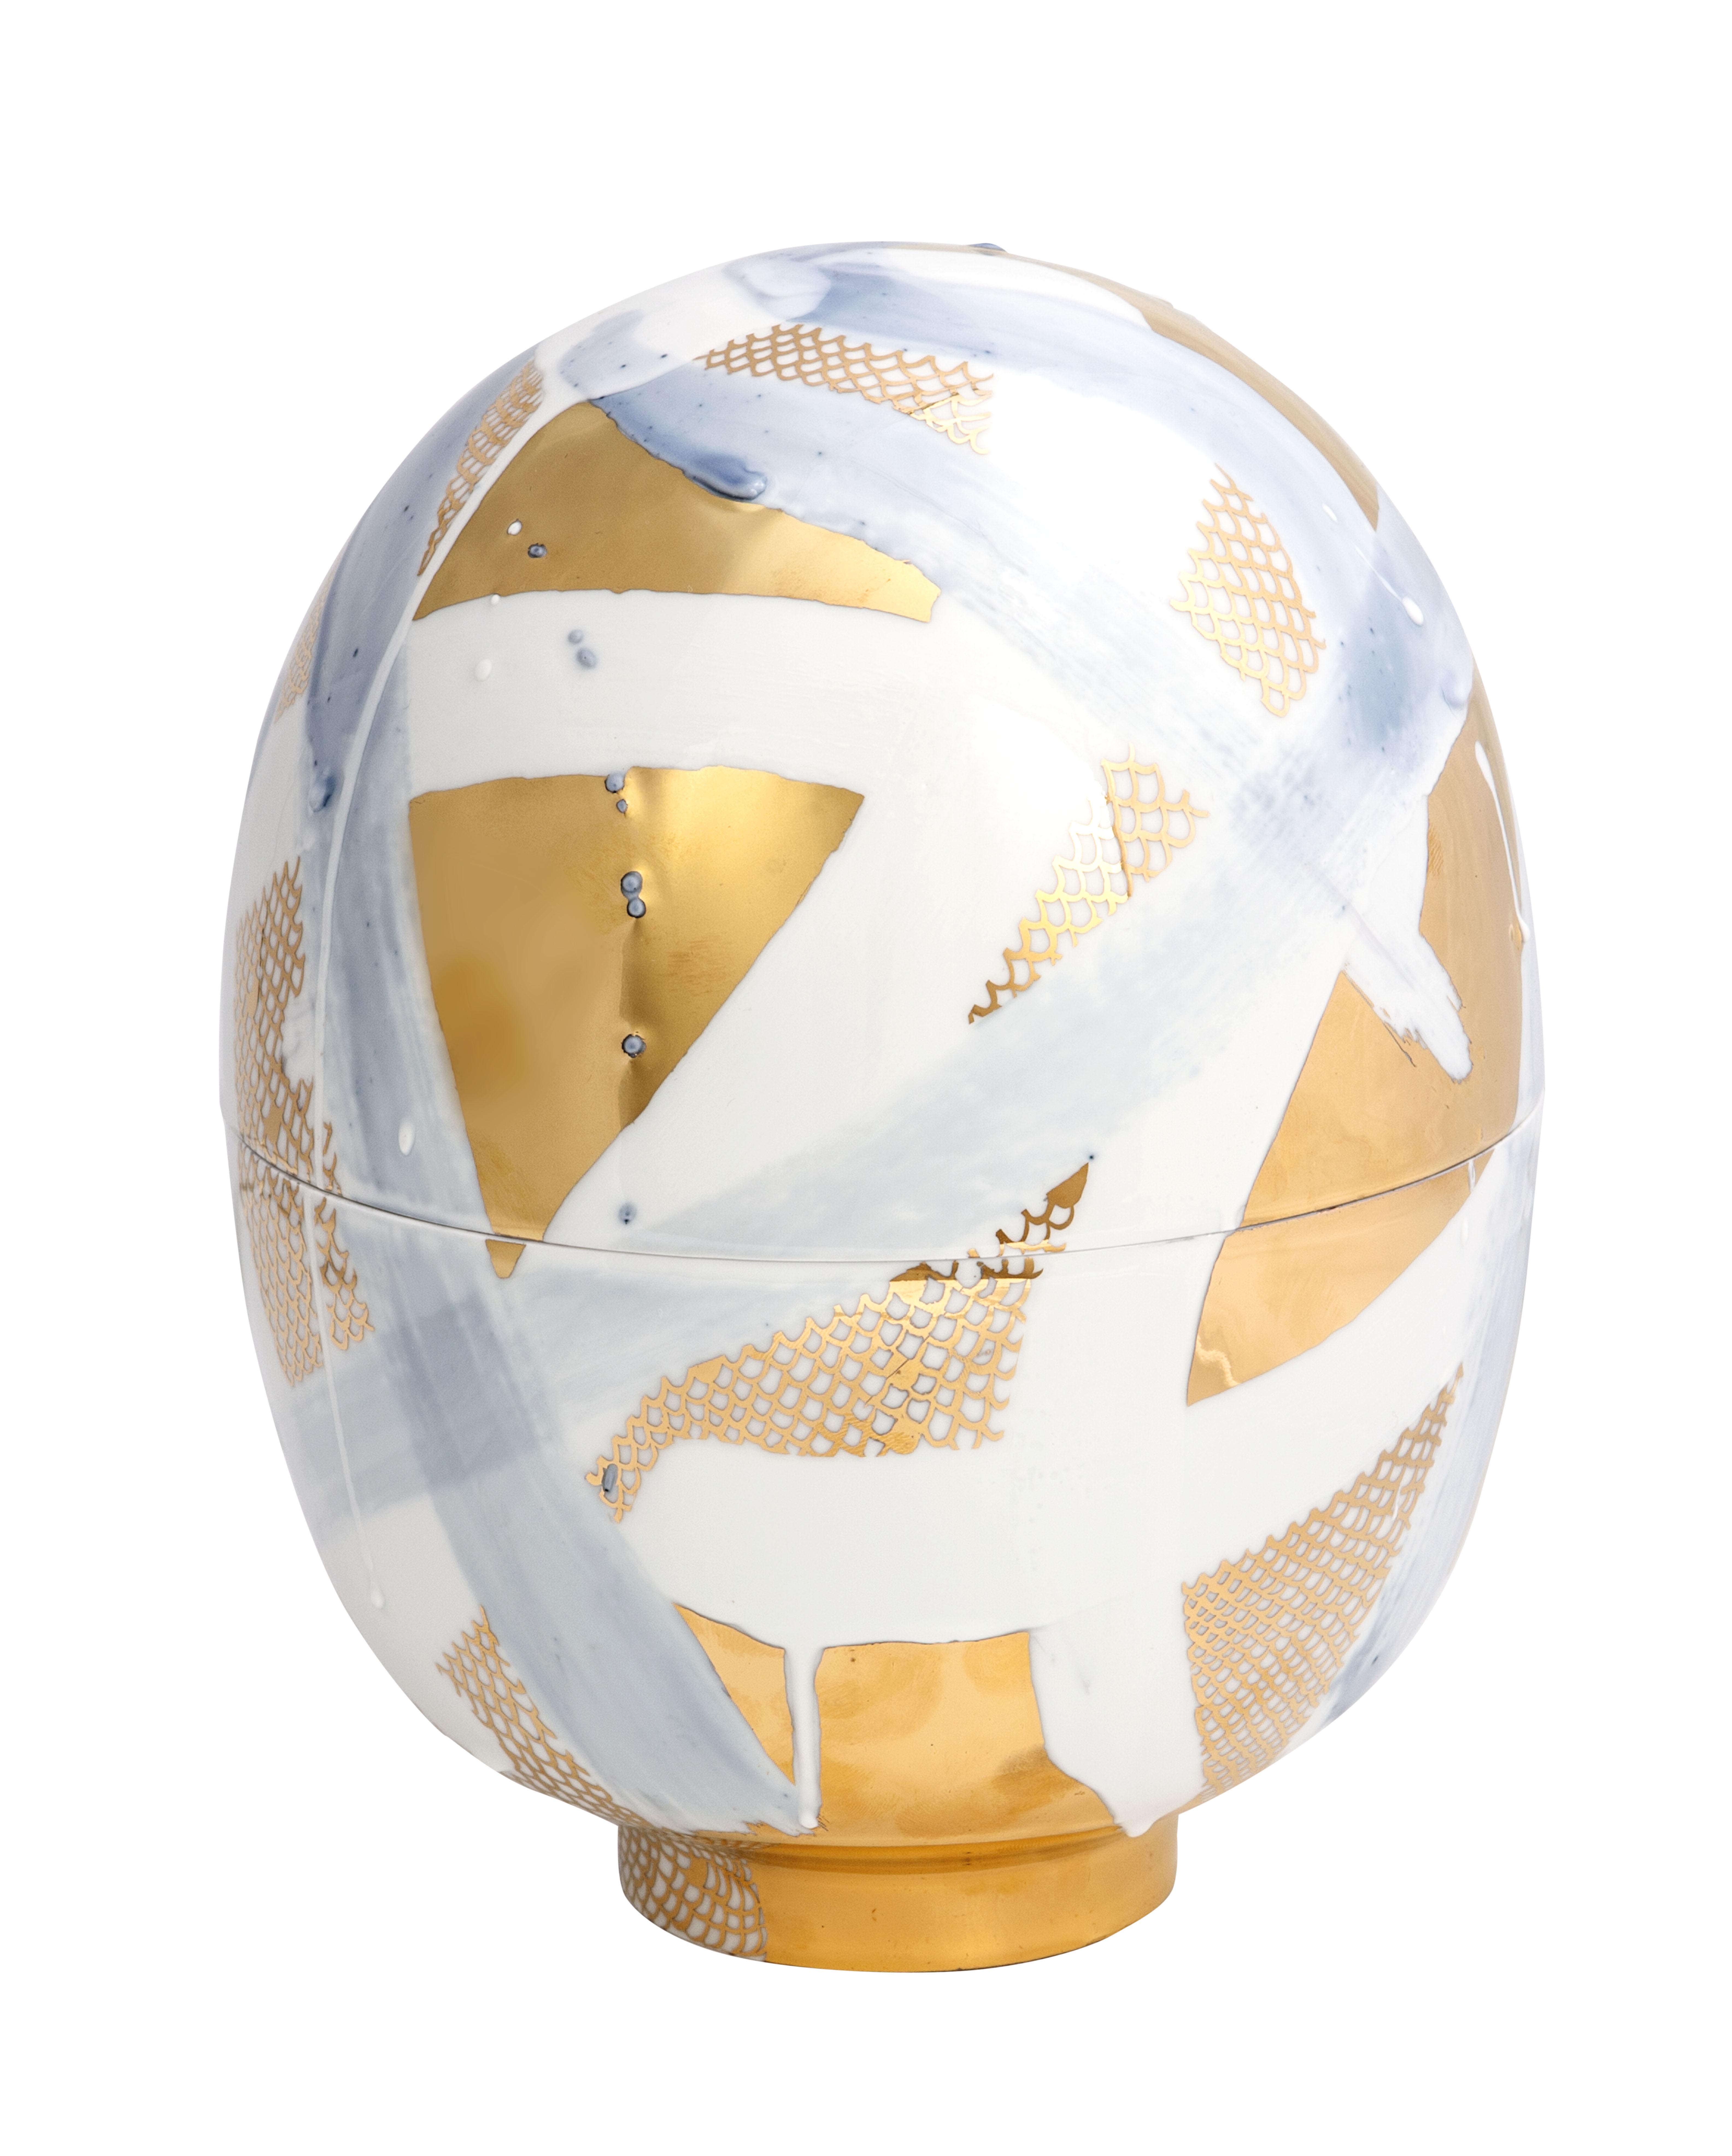 Egg Vessel Blue and Gold Meissen